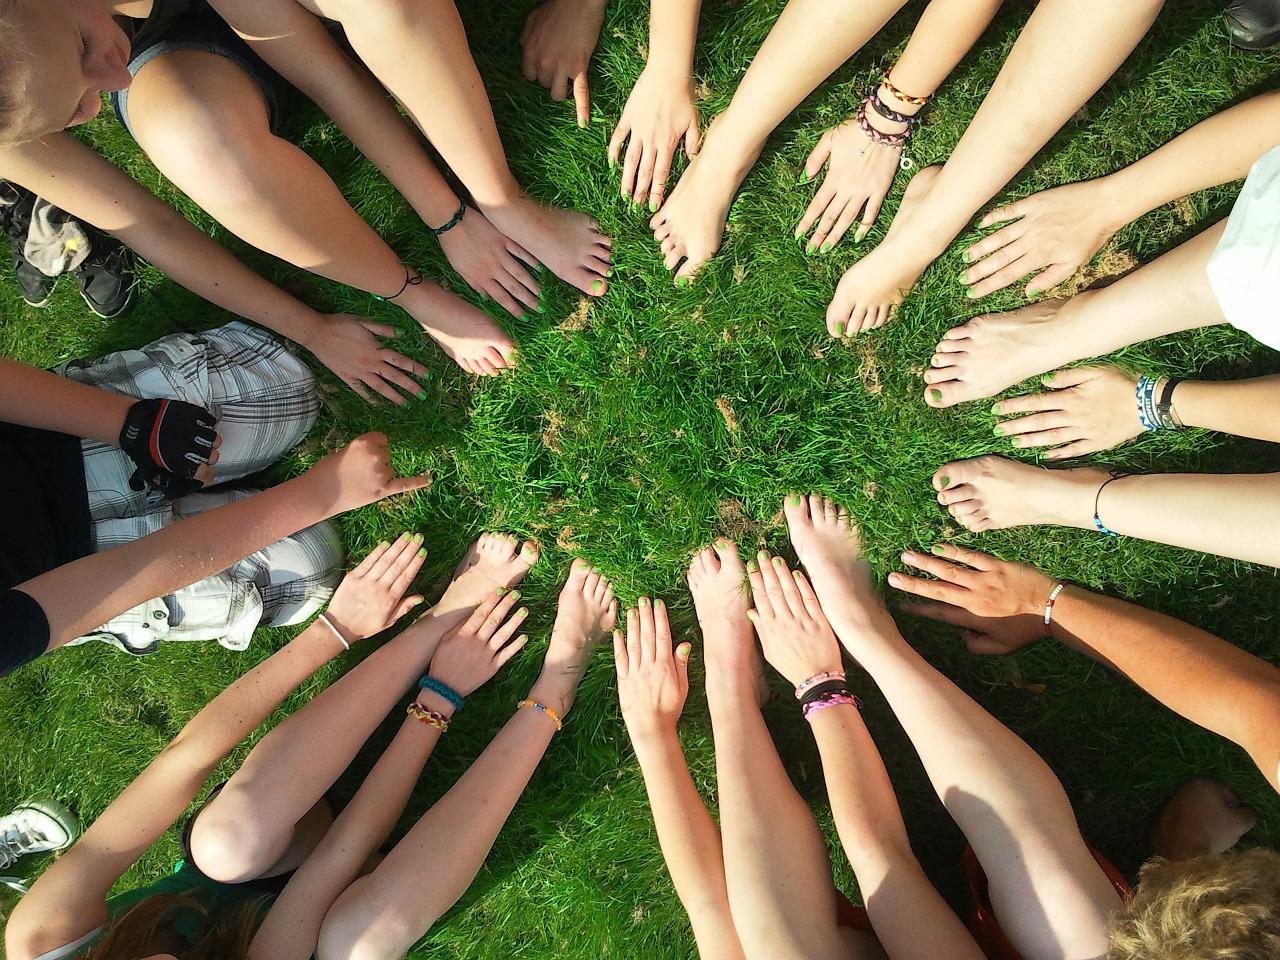 team, partner, netzwerken, meeting, networking, smalltalk